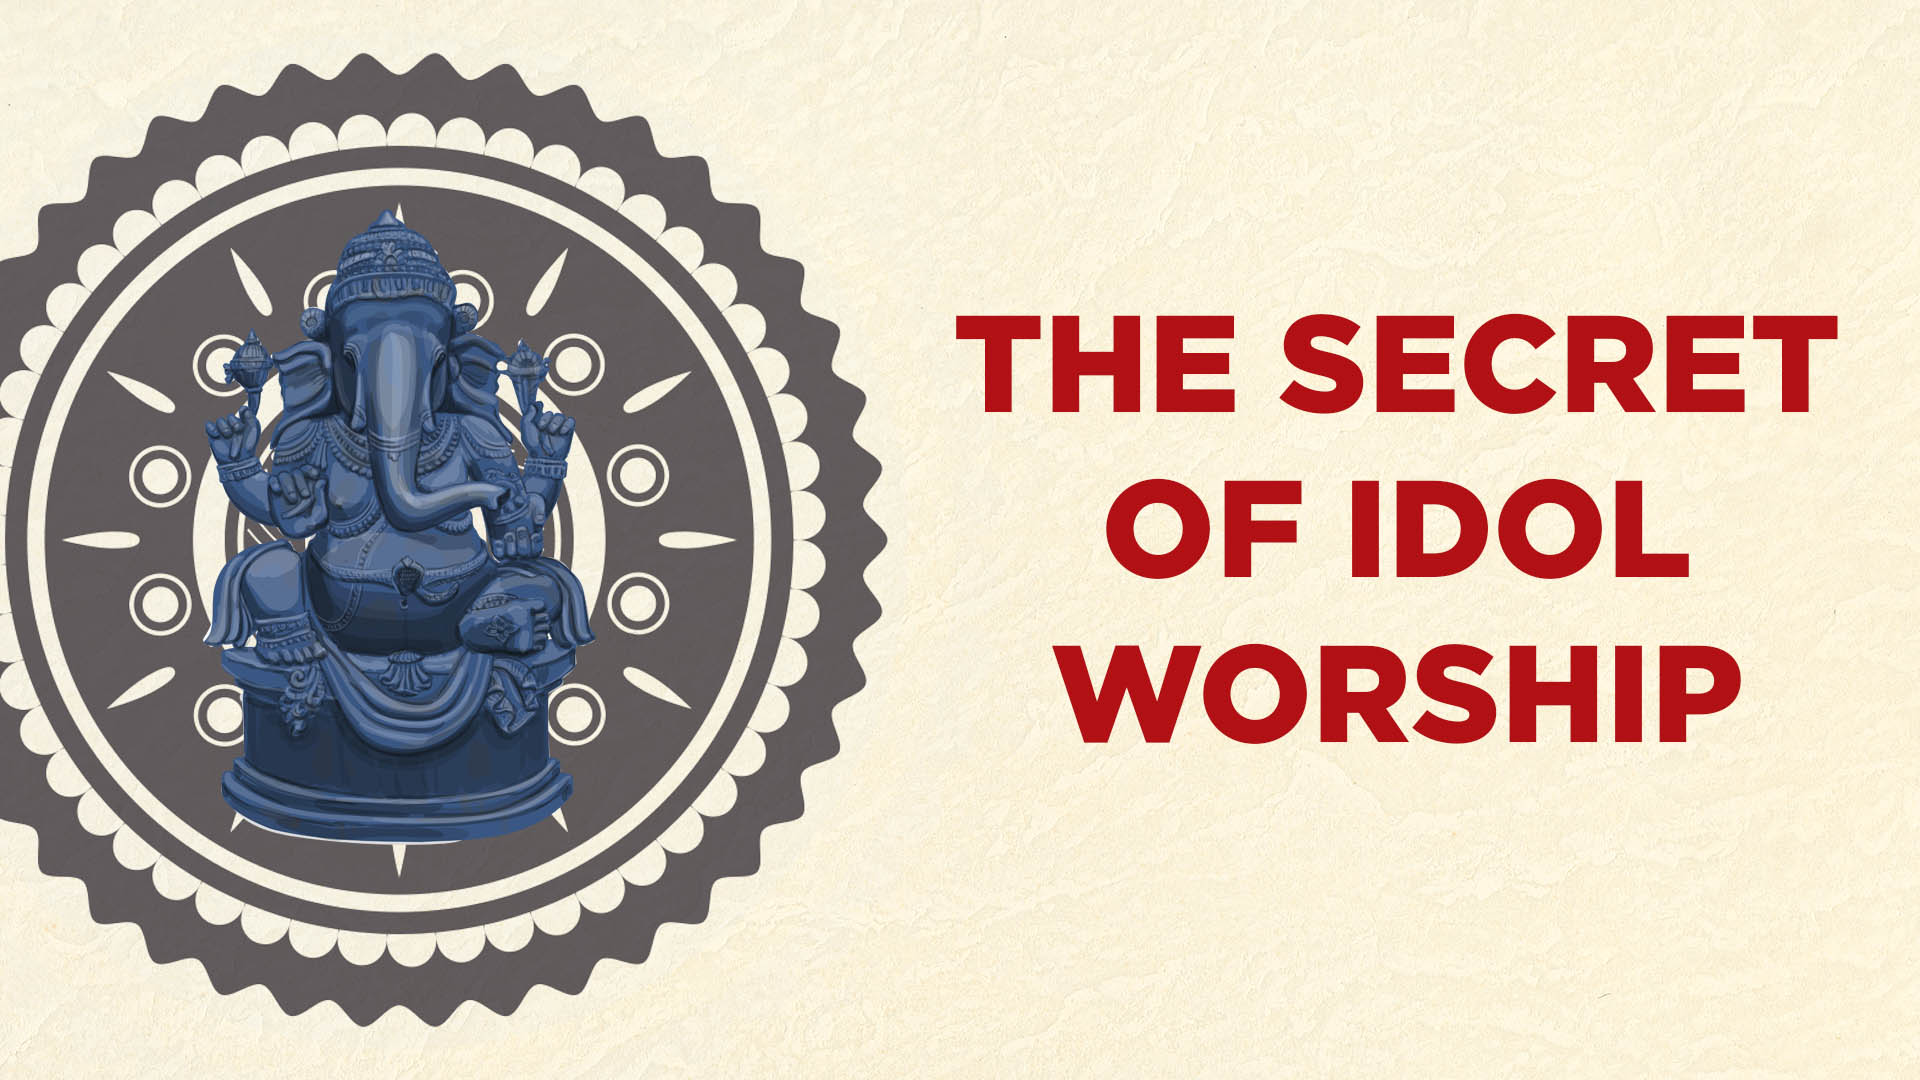 The secret of idol worship